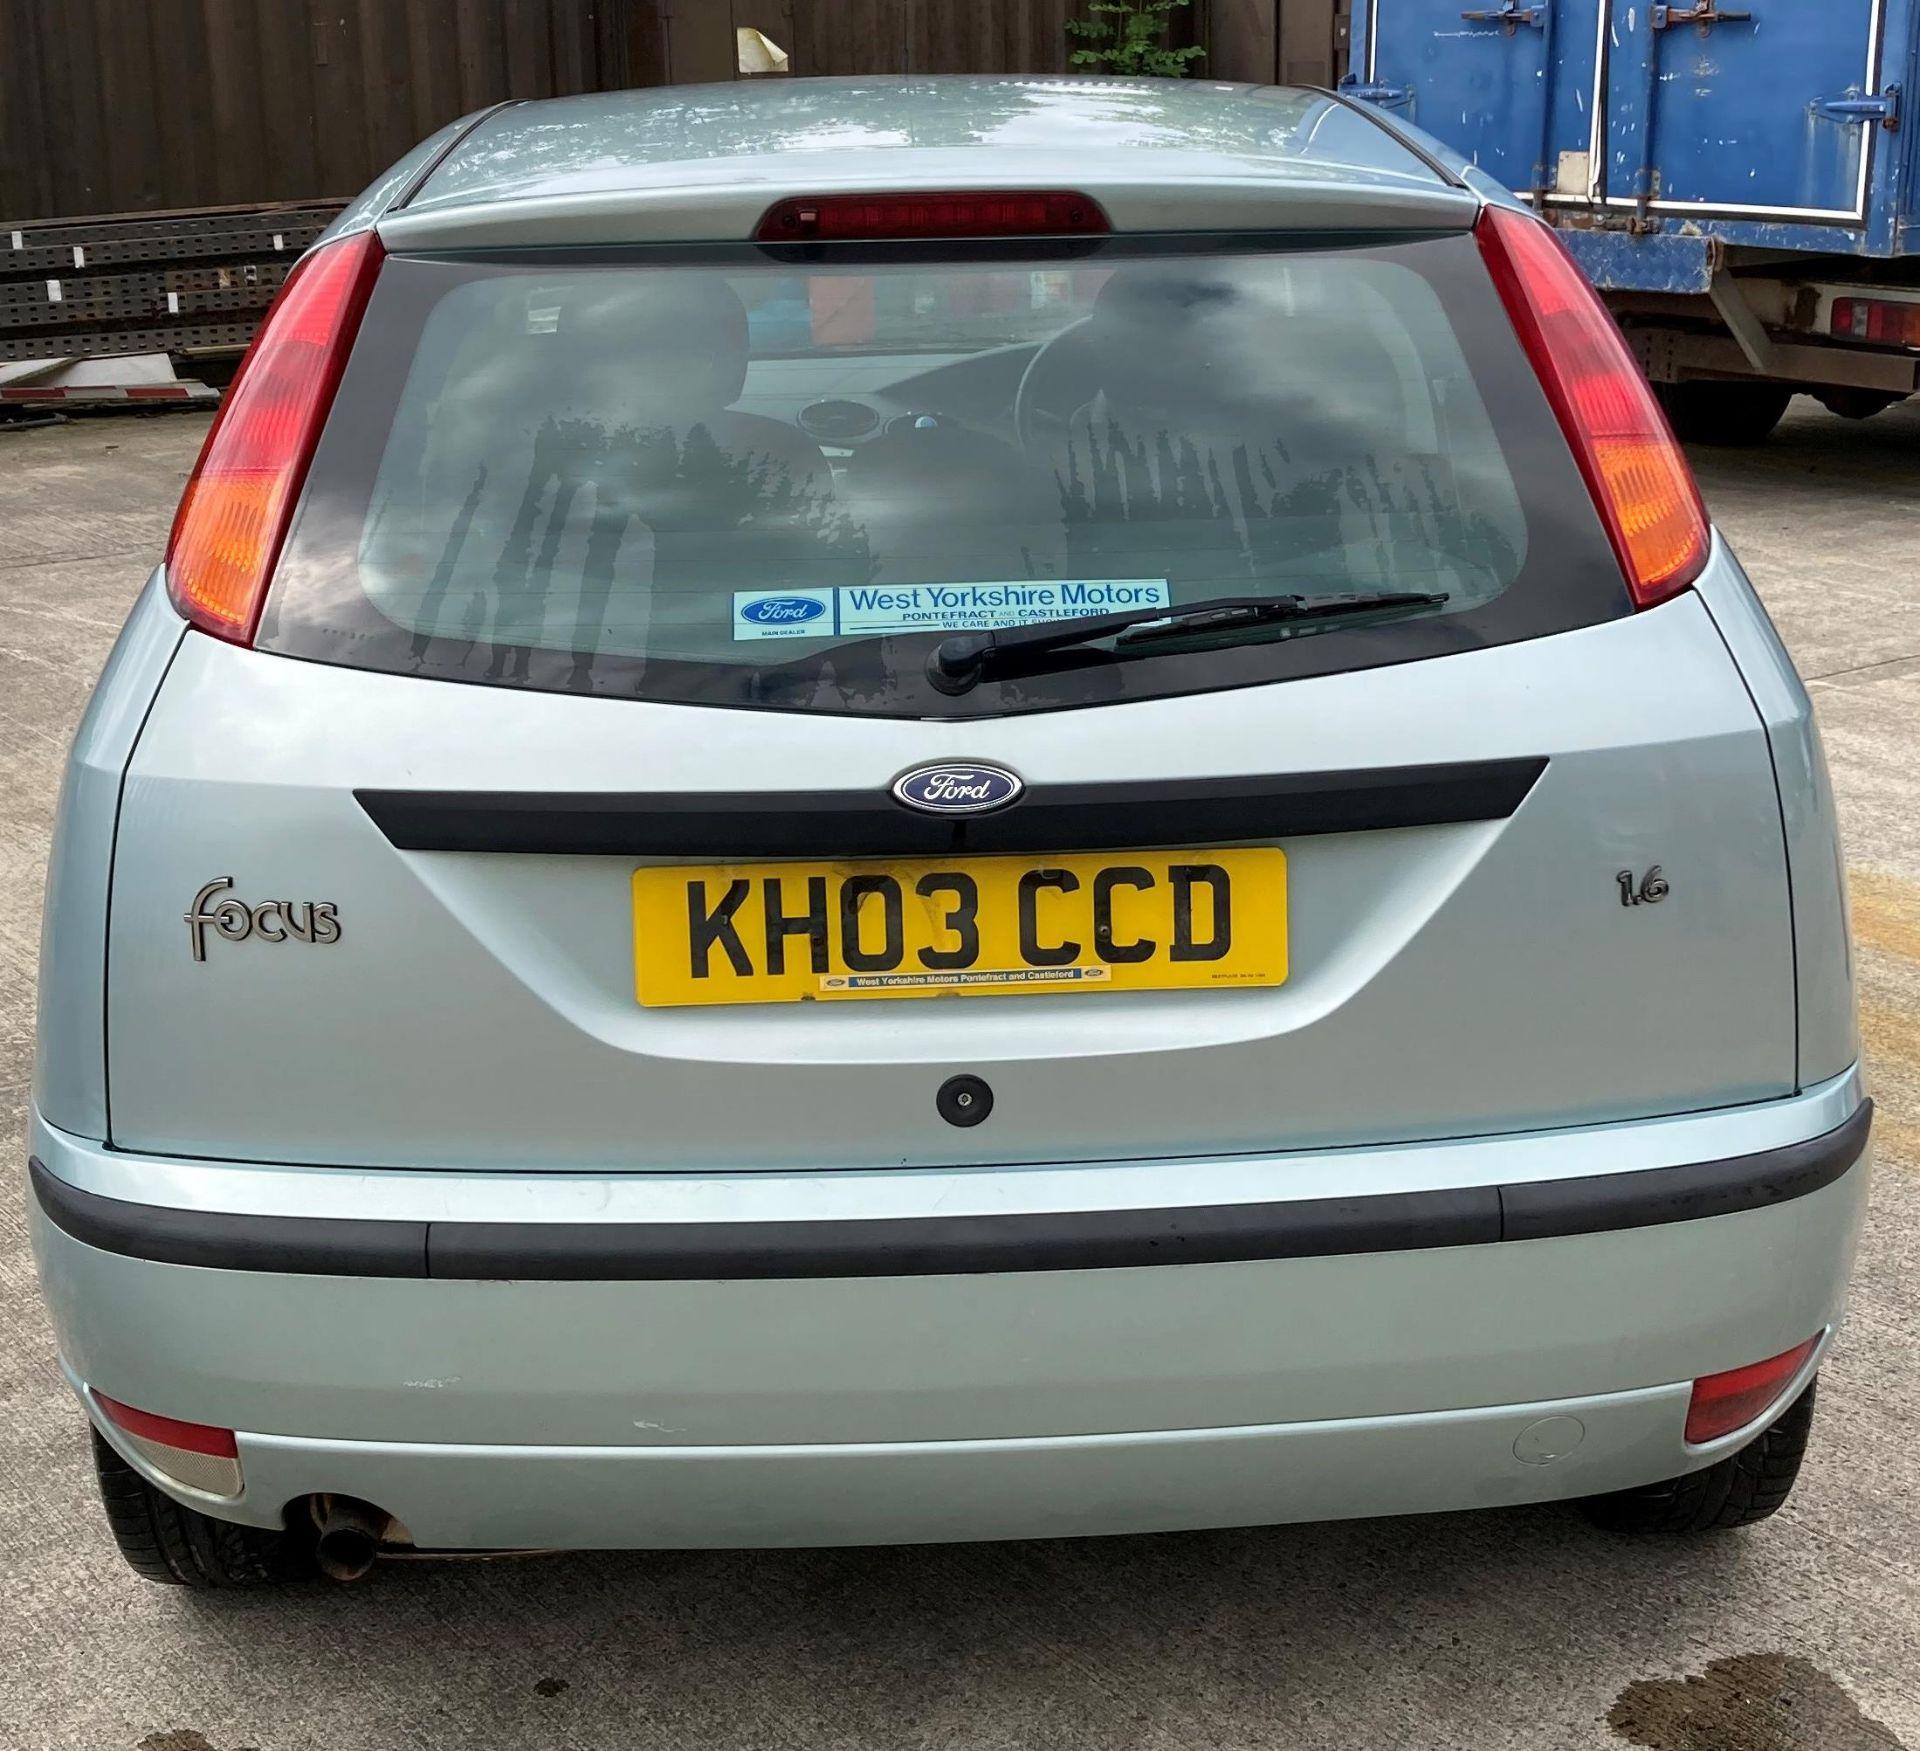 FORD FOCUS ZETEC 1.6 5 door hatchback - petrol - light green Reg No: KH03 CCD Rec. - Image 4 of 4